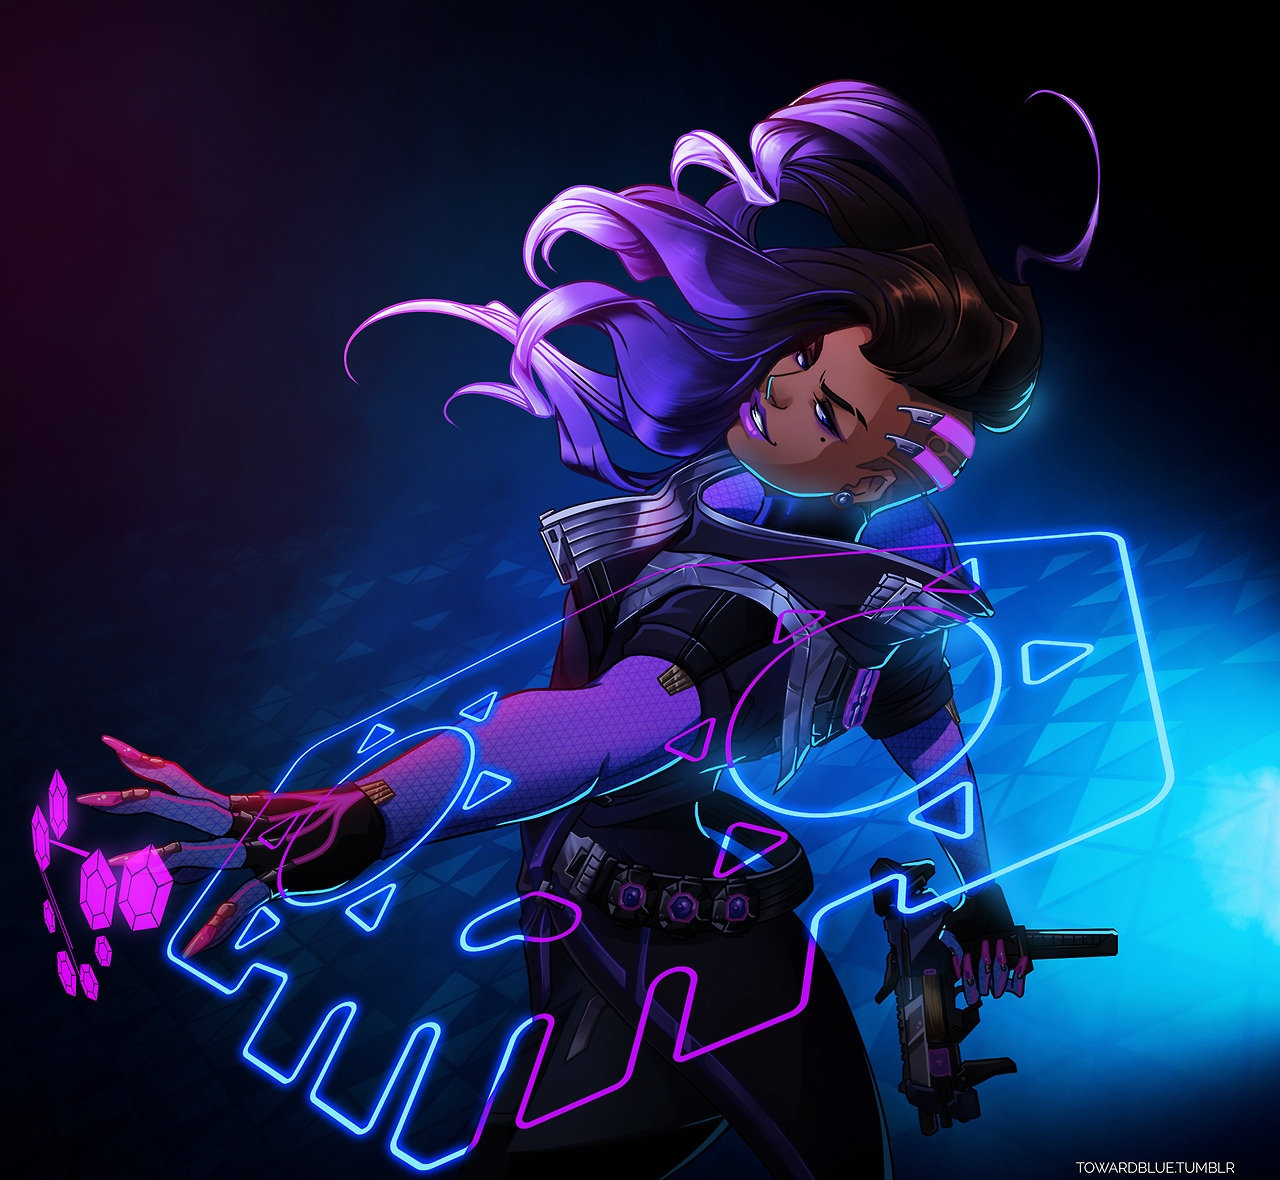 Sombra-(Overwatch)-Overwatch-Blizzard-фэндомы-5062351.jpeg - Overwatch